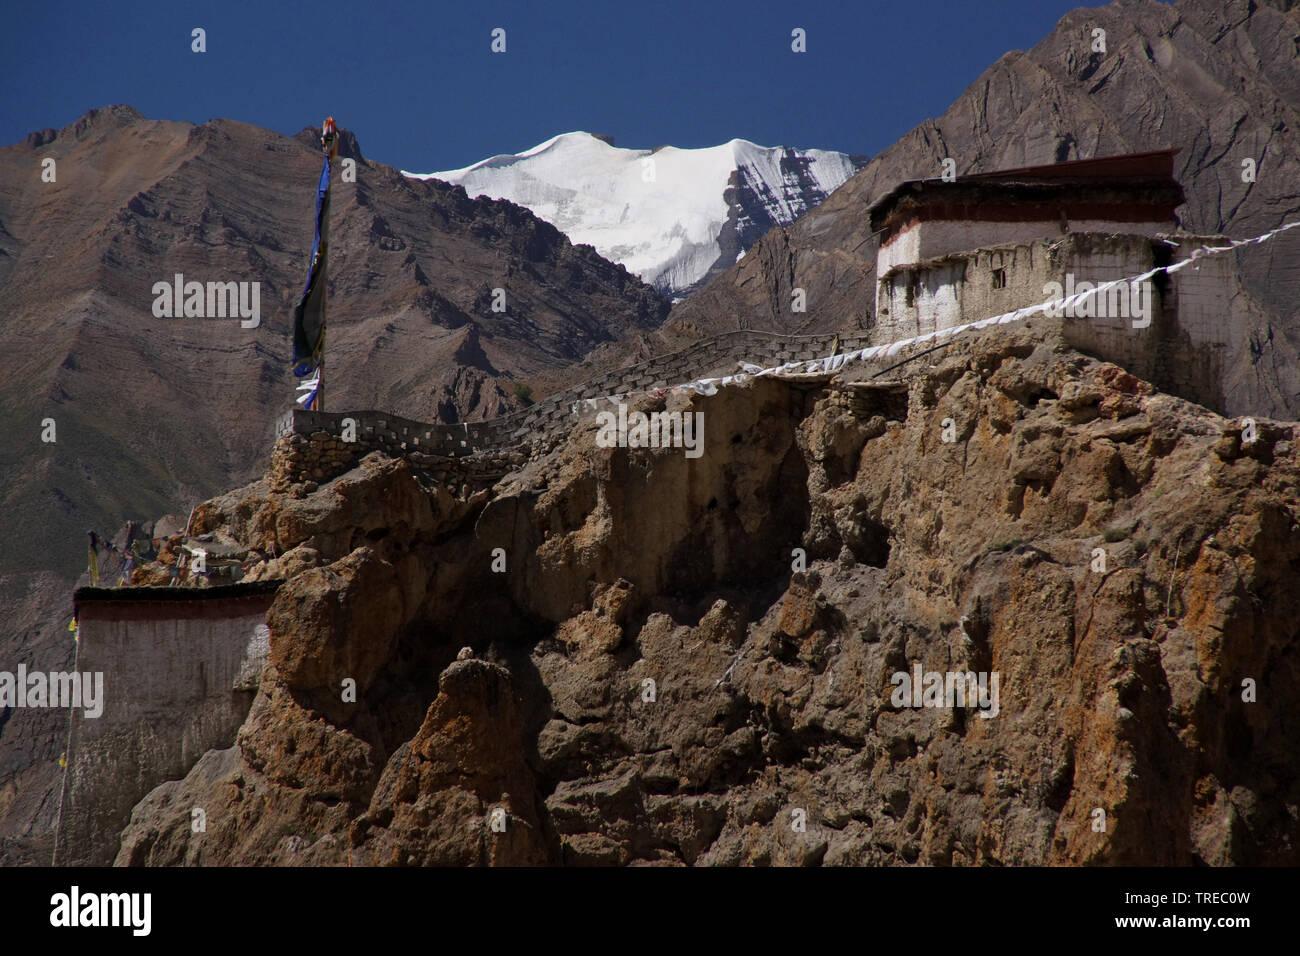 Kloster Dhankar, Spiti Tal, Indien, Himachal Pradesh, Spiti   Dhankar Gompa, Spiti Tal, India, Himachal Pradesh, Spiti   BLWS522521.jpg [ (c) blickwin - Stock Image